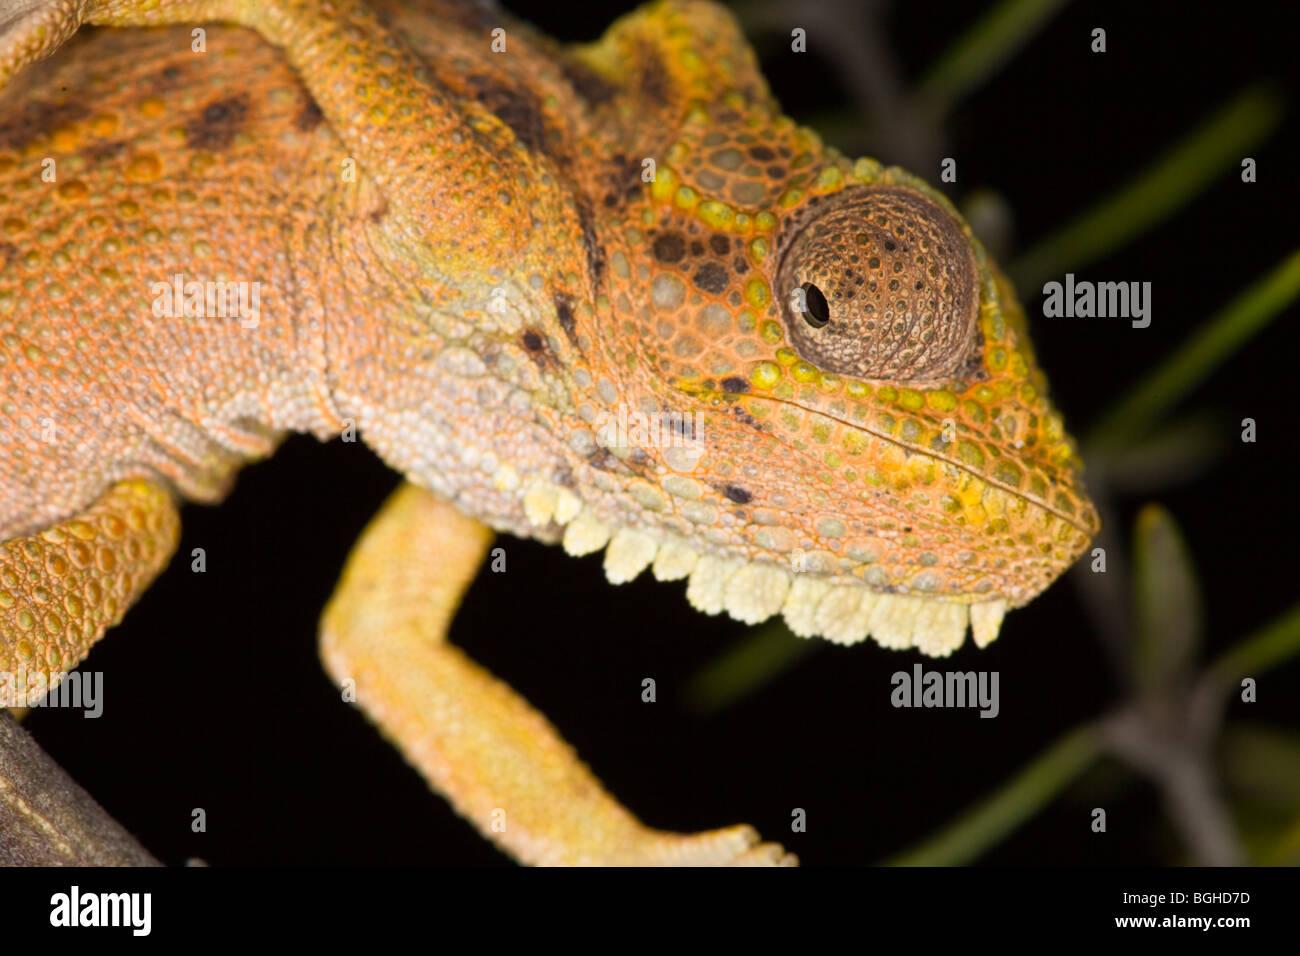 Transvaal dwarf chameleon - Stock Image